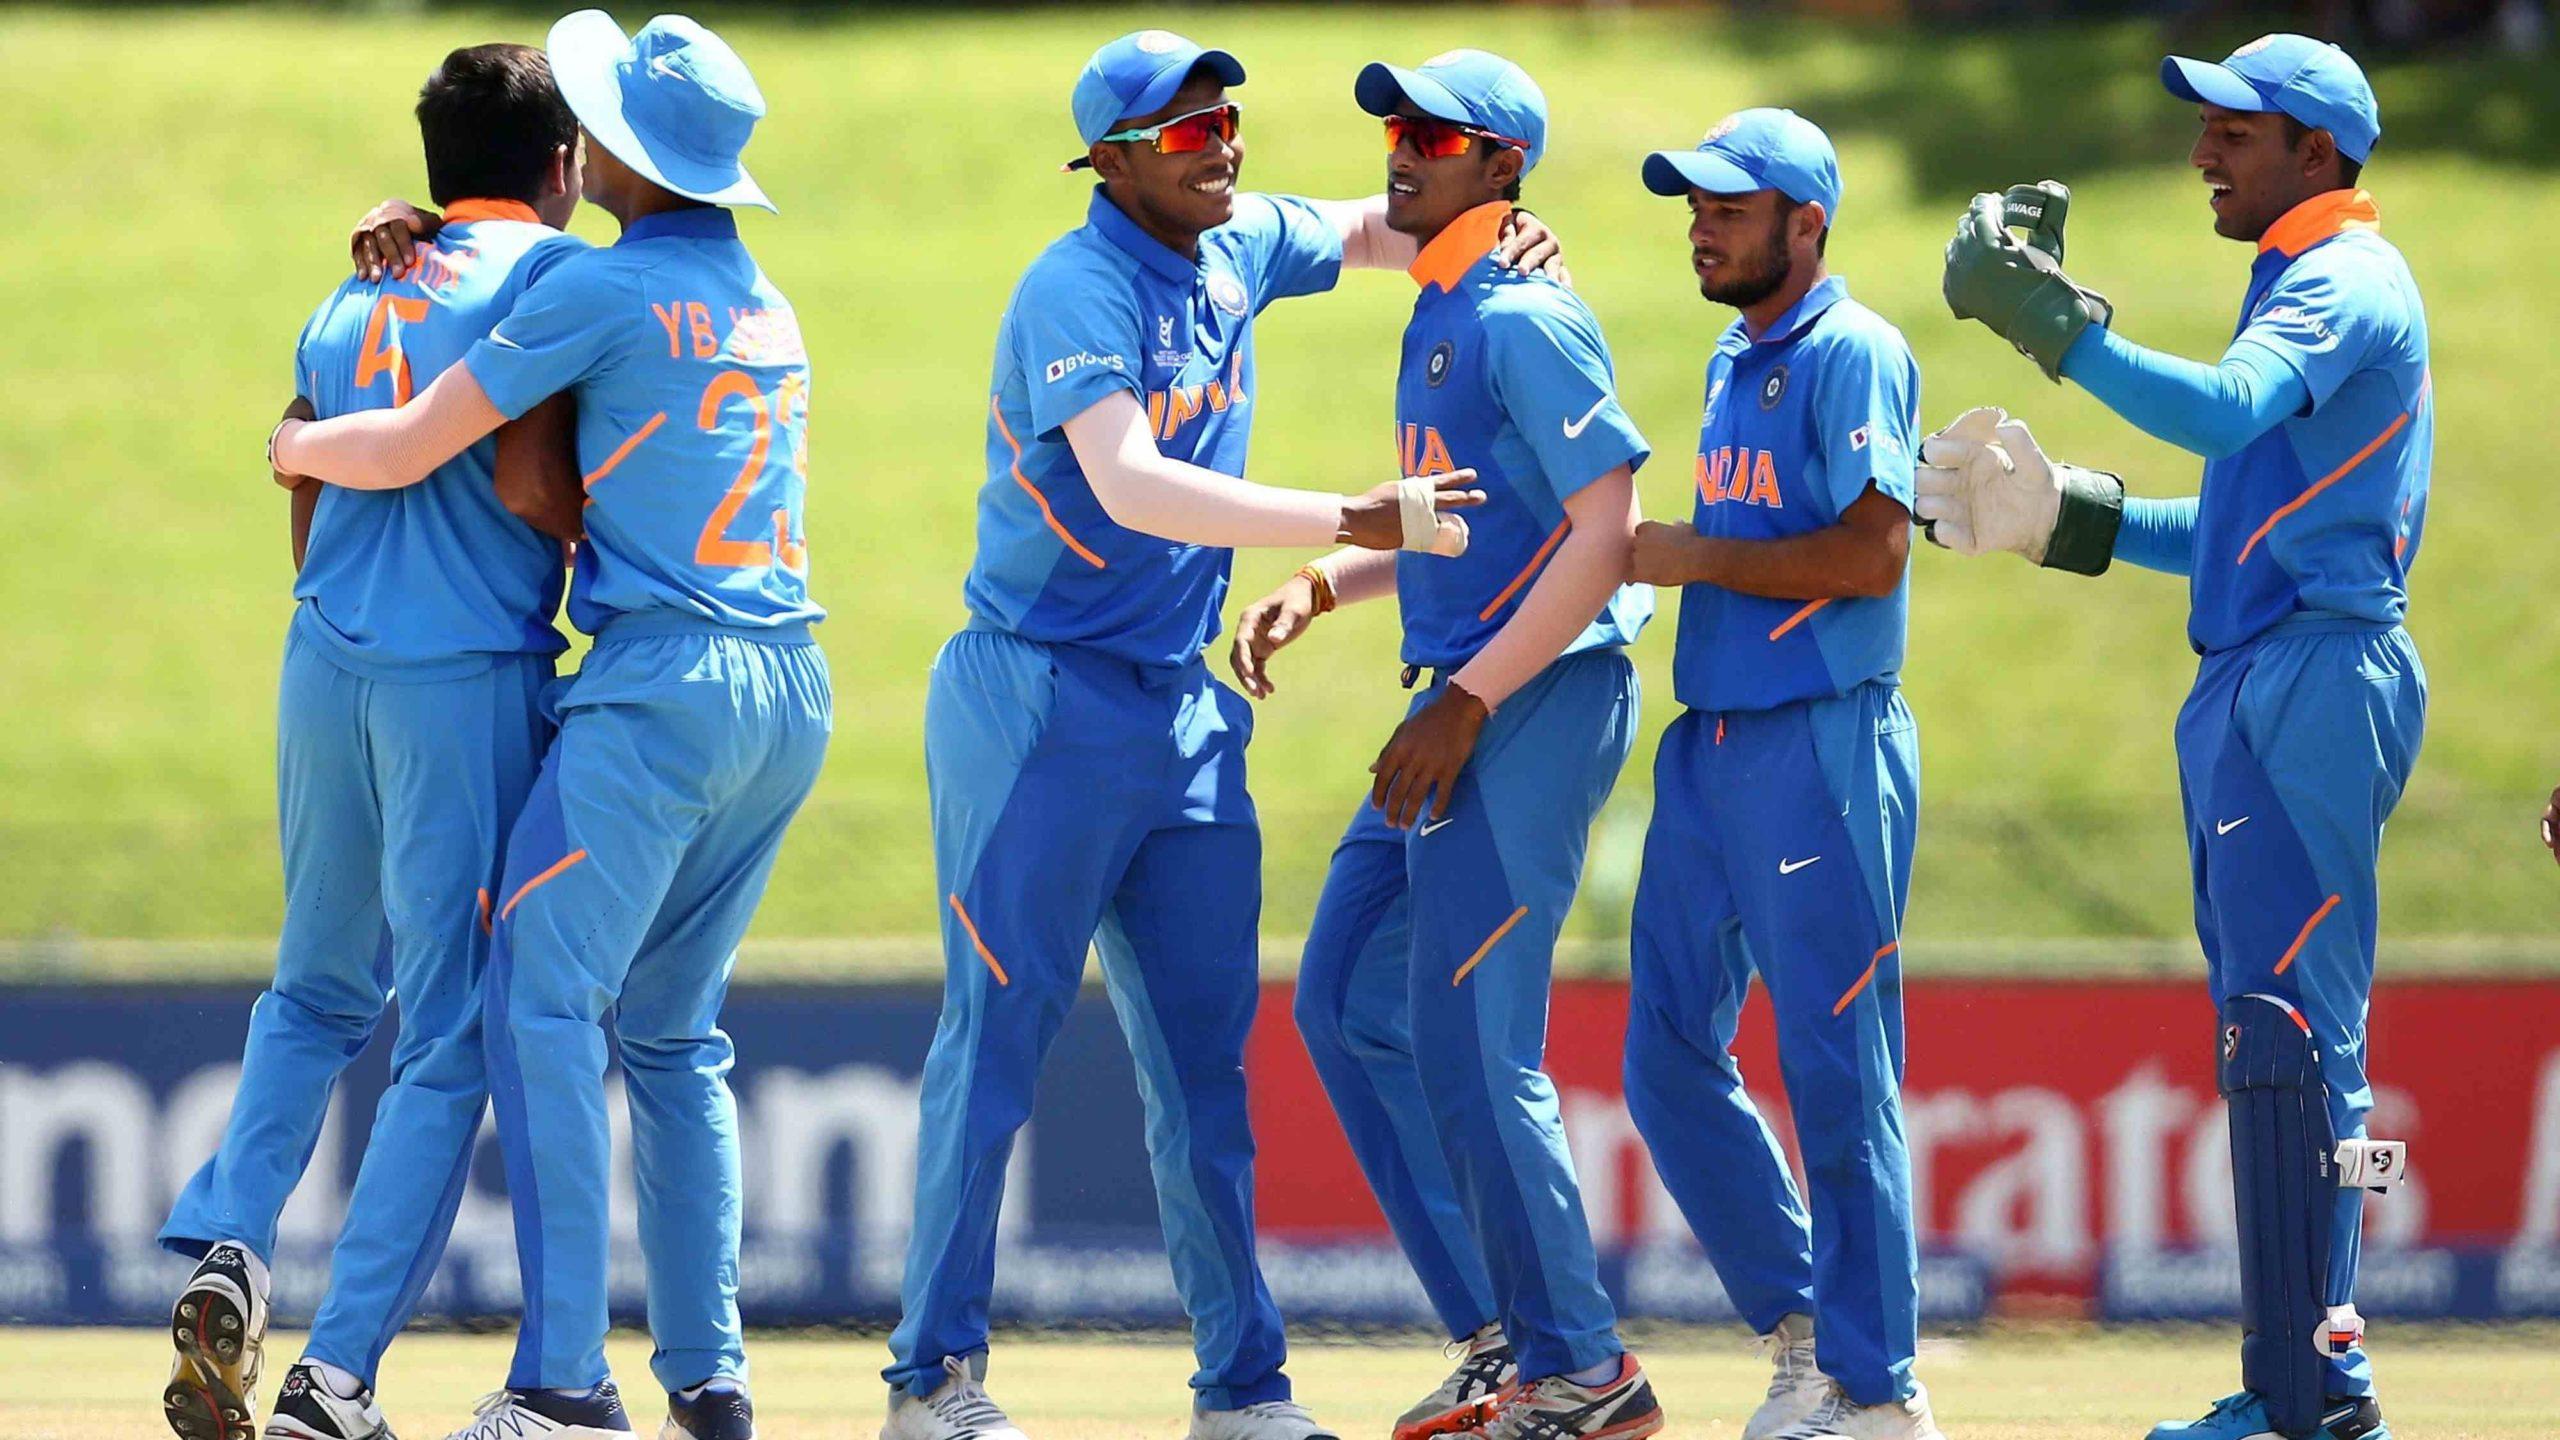 India_under_19_World_Cup_team